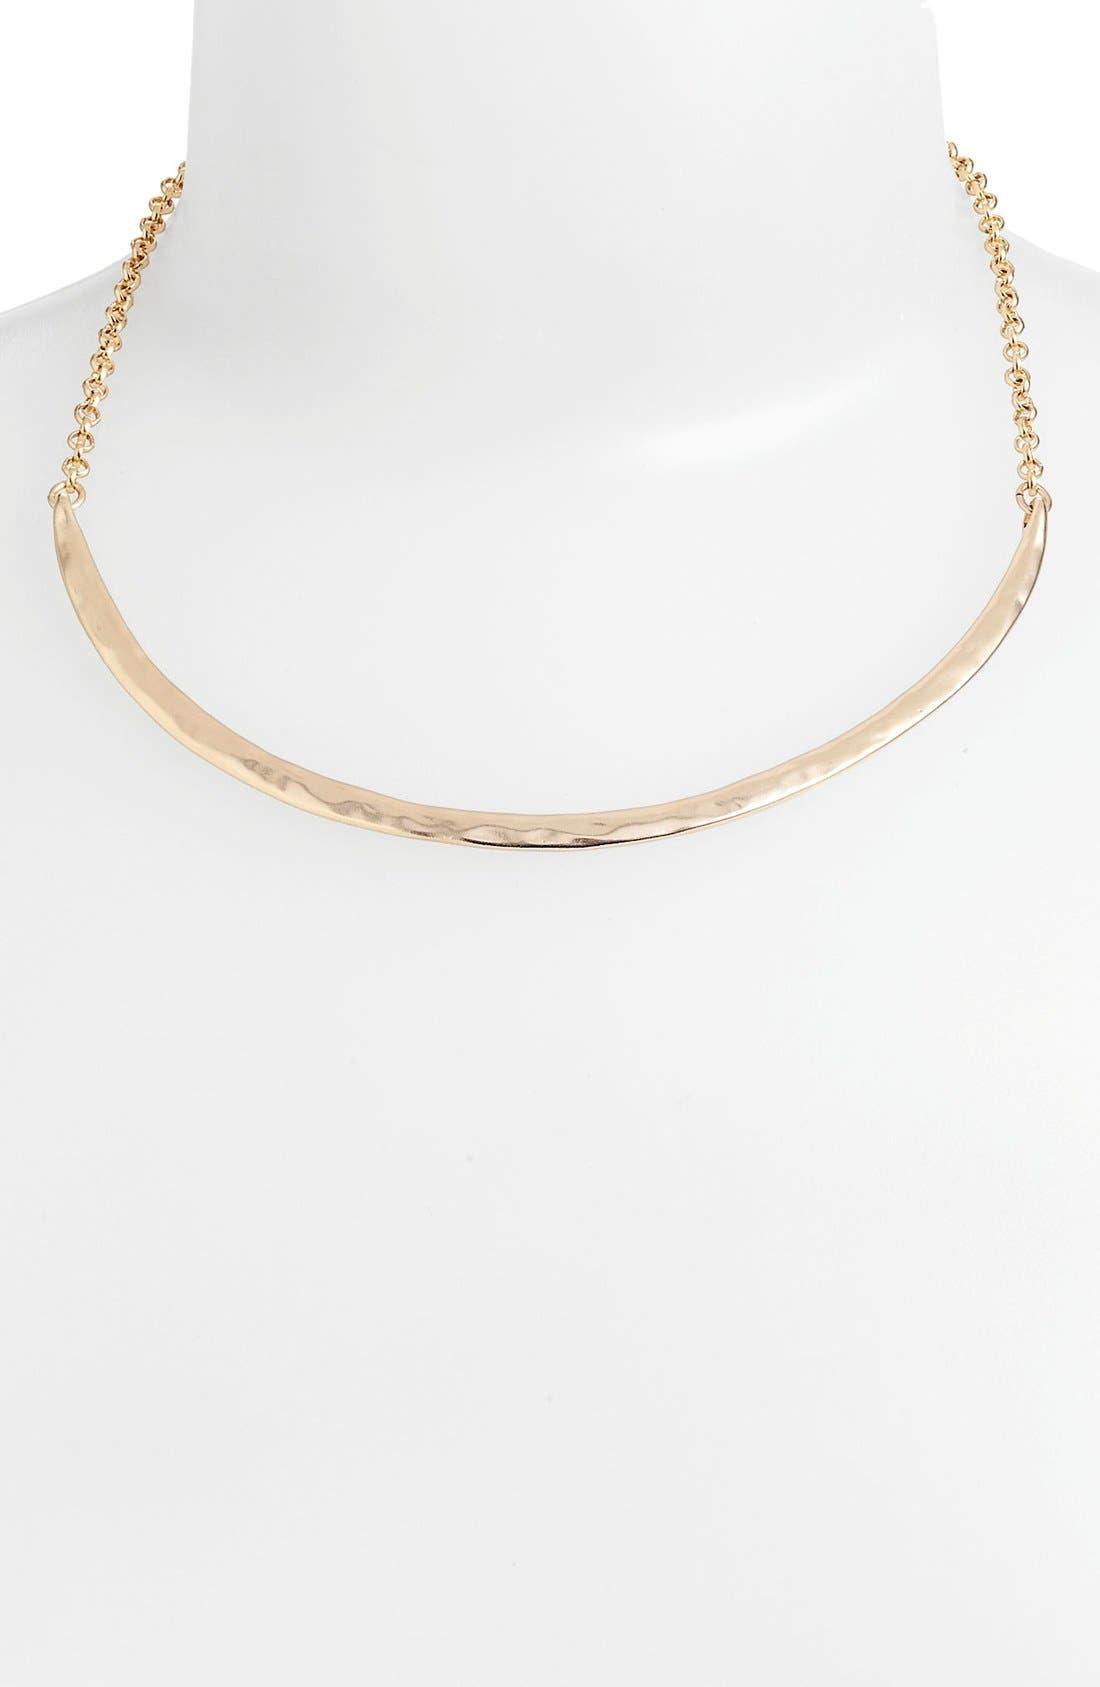 Alternate Image 1 Selected - Nordstrom 'Azteca' Curved Bar Necklace